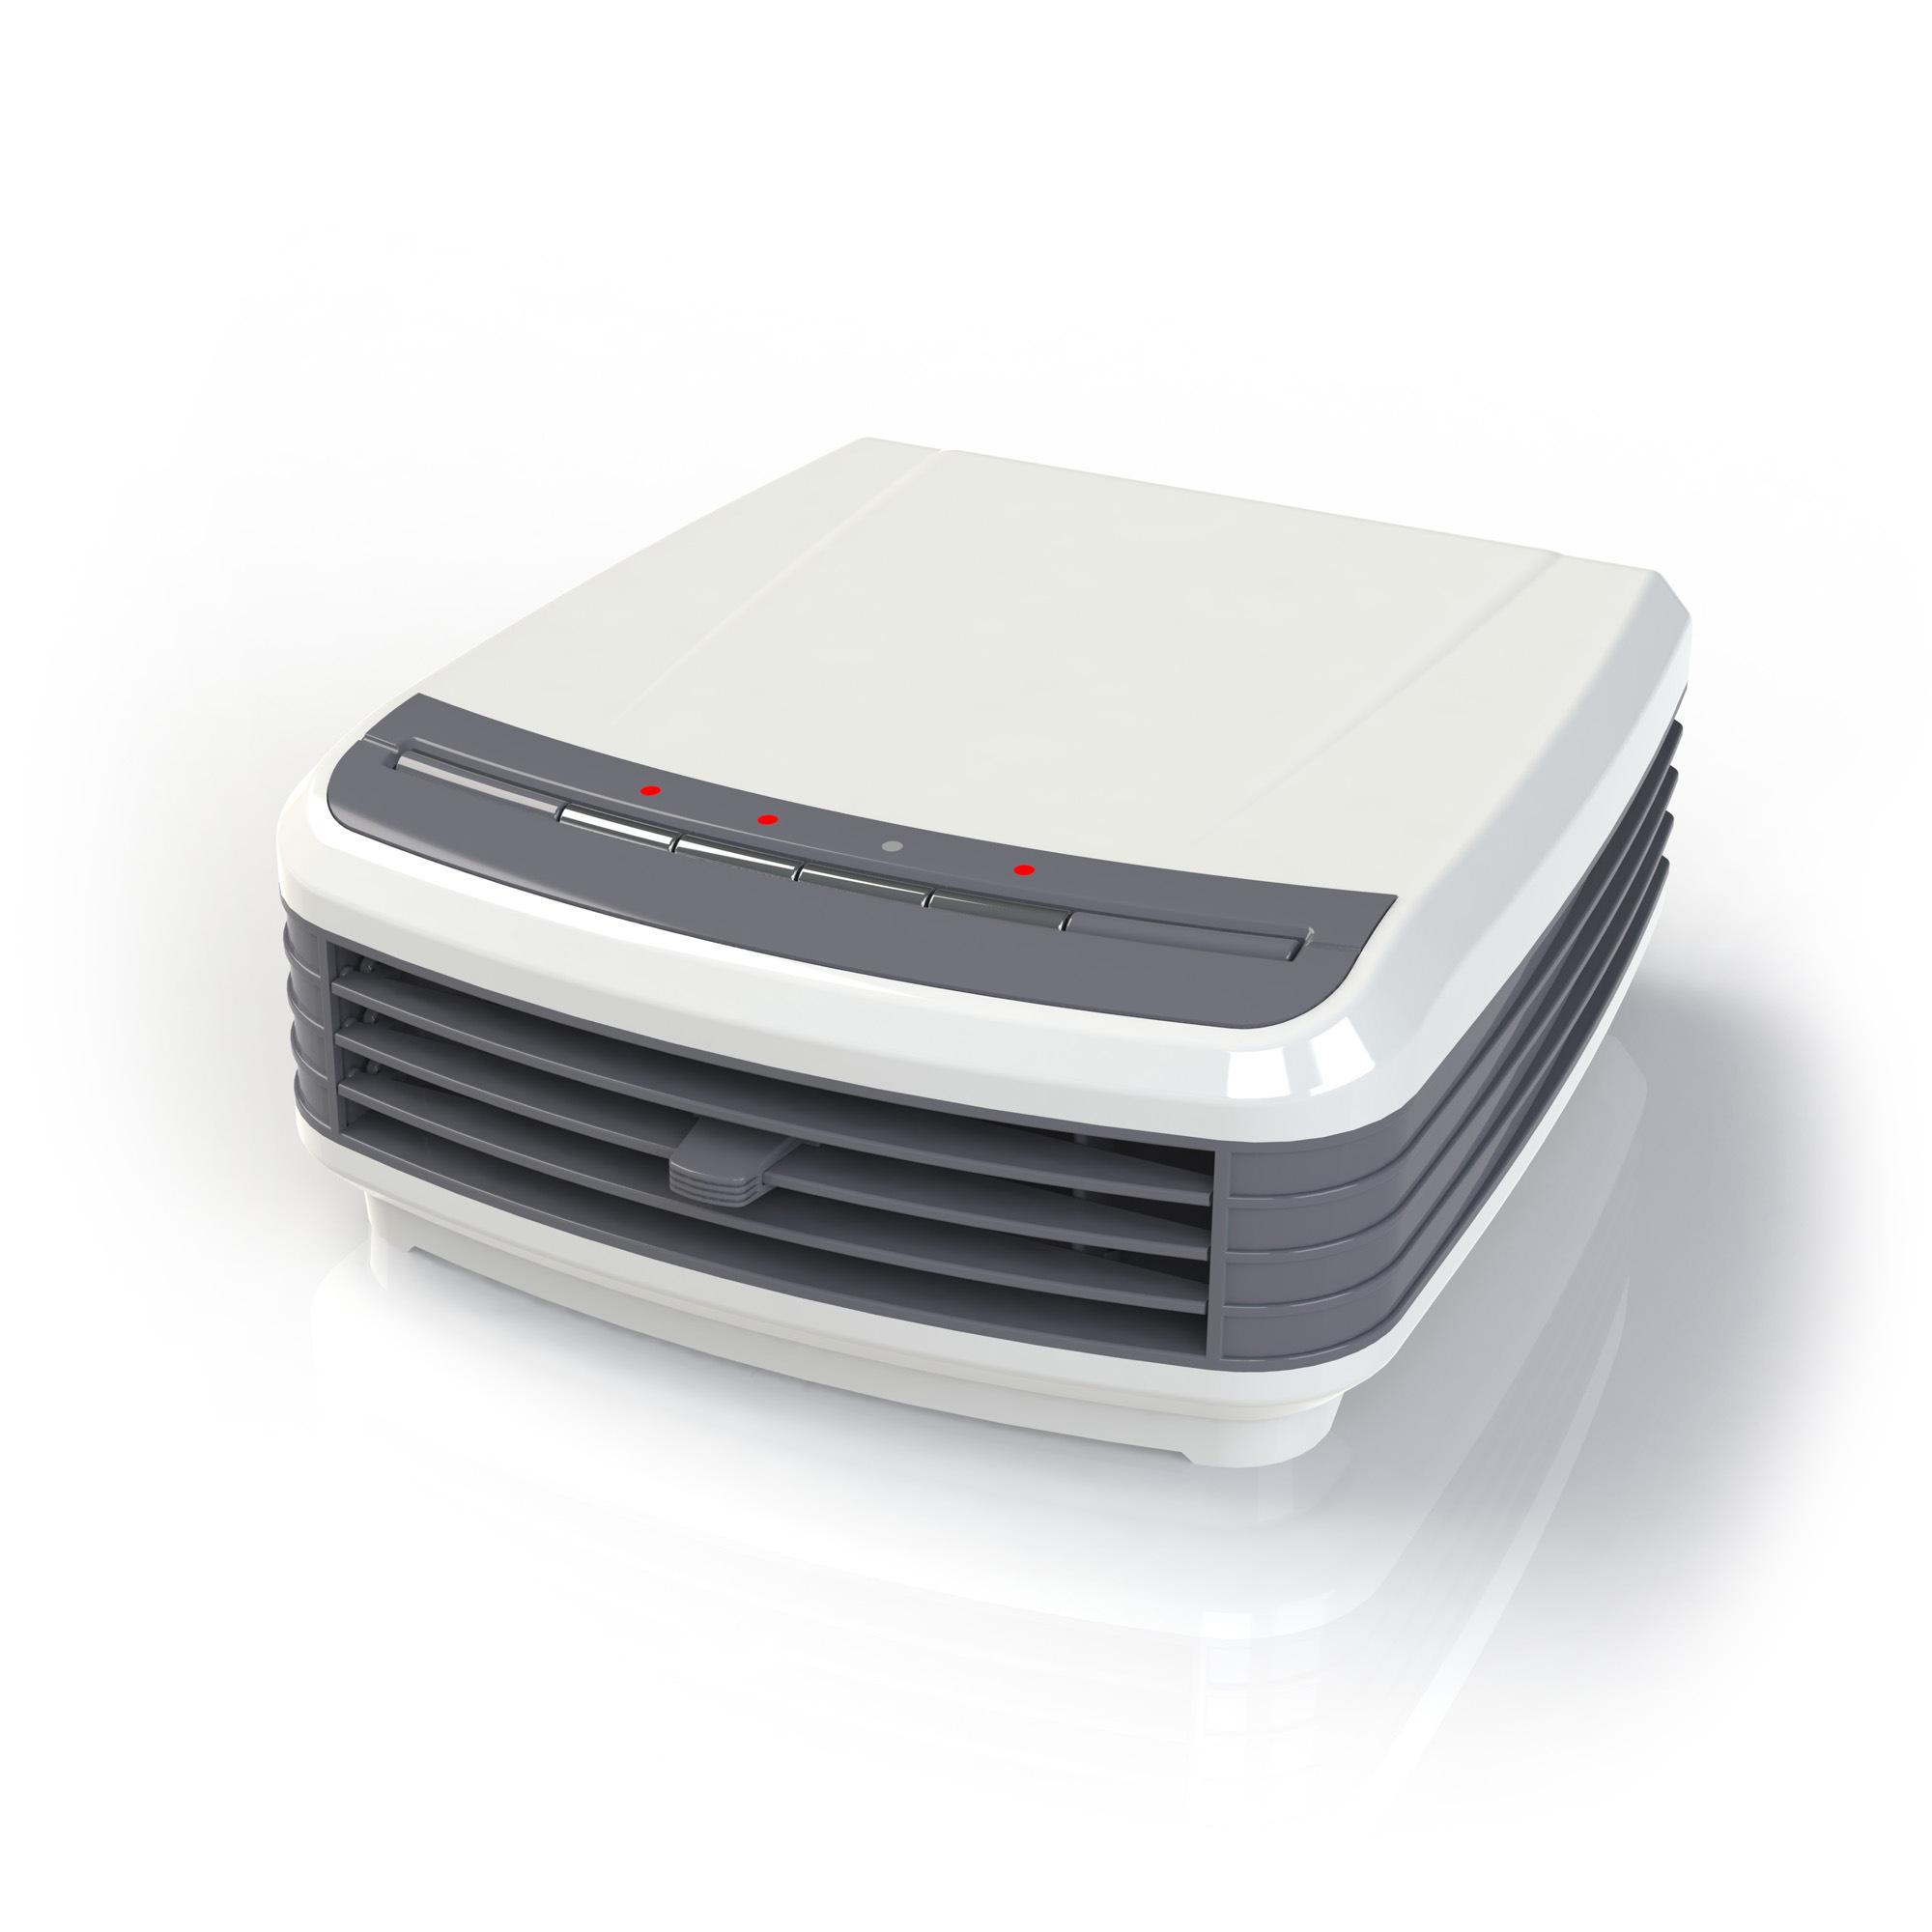 Trane Xt500c Wiring Diagram. Trane Heat Pumps Thermostat Wiring ...